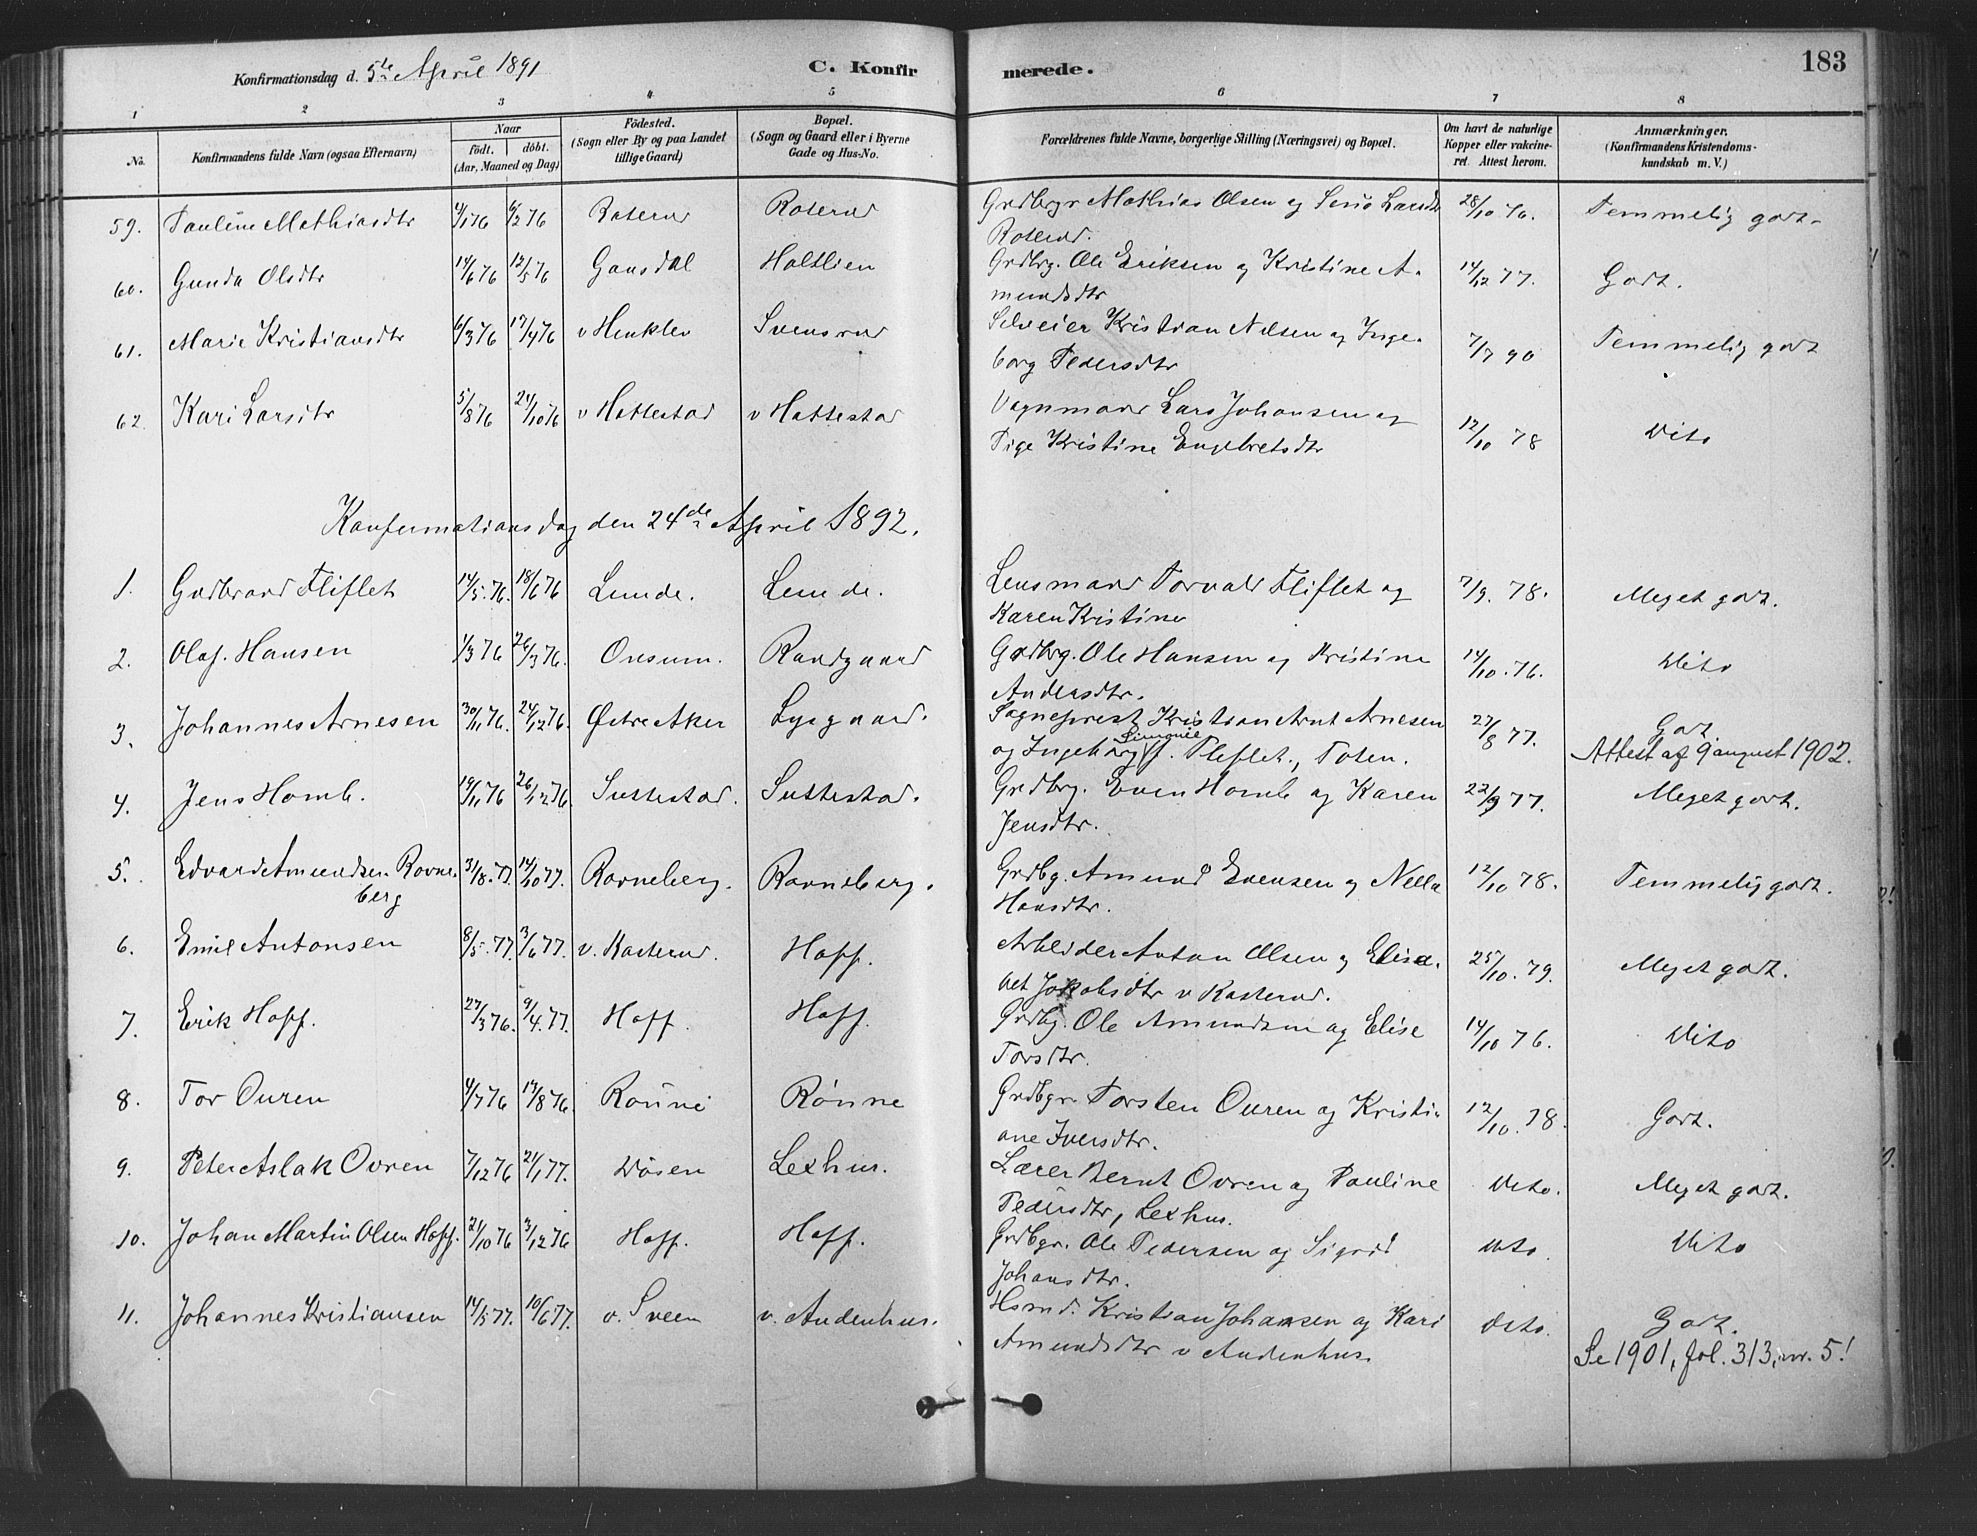 SAH, Fåberg prestekontor, Ministerialbok nr. 9, 1879-1898, s. 183